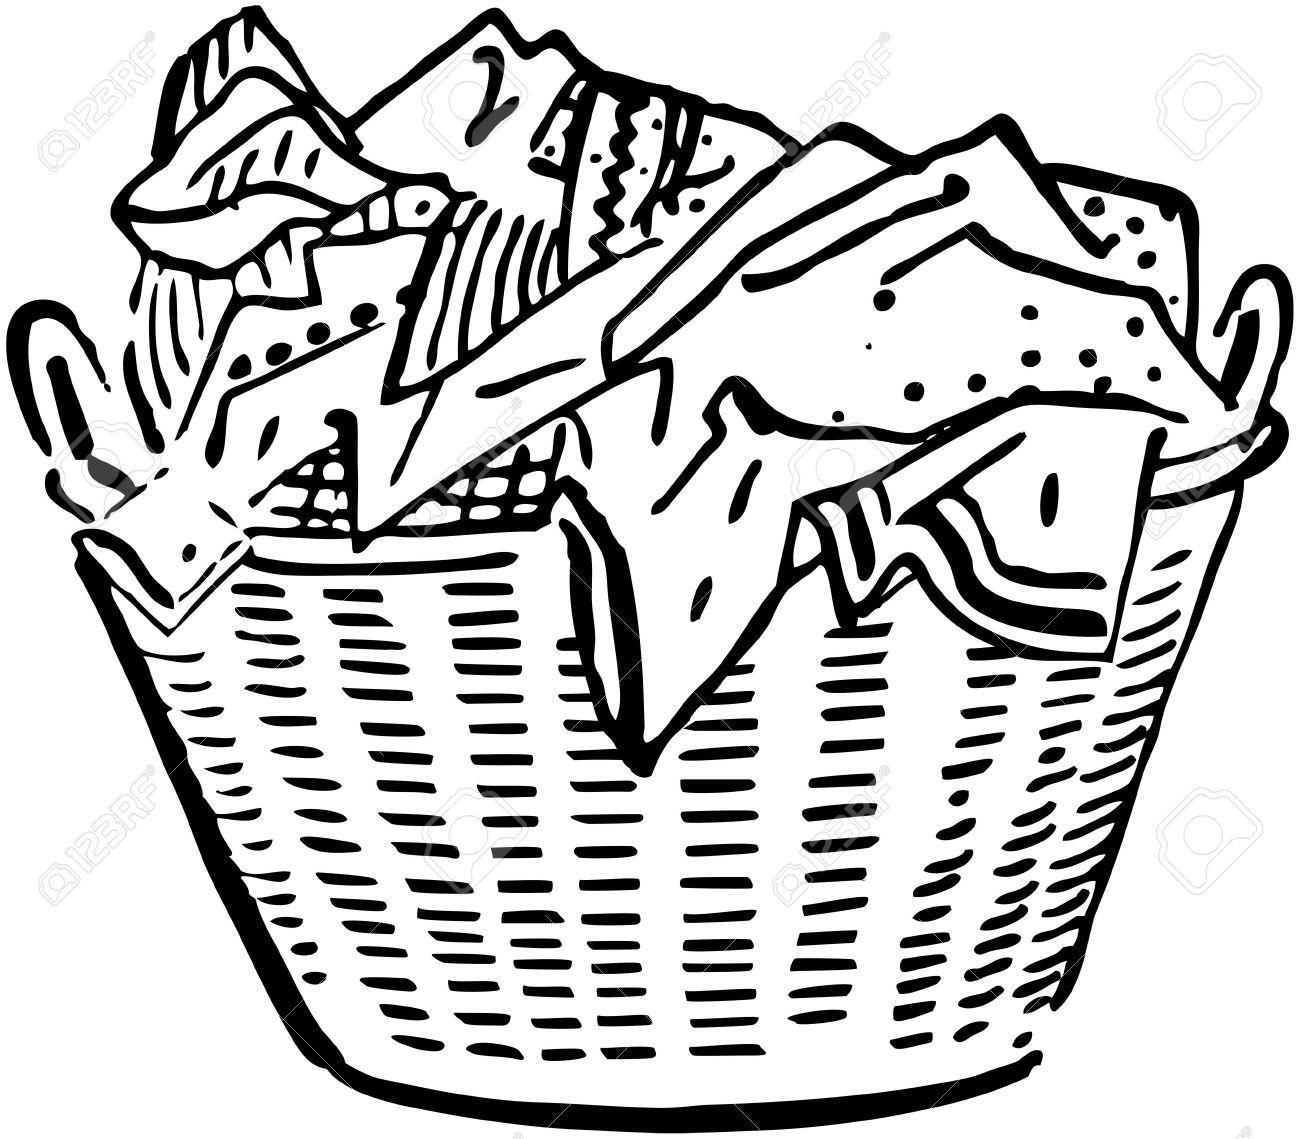 Laundry Basket Laundry Clip Art Basket Drawing